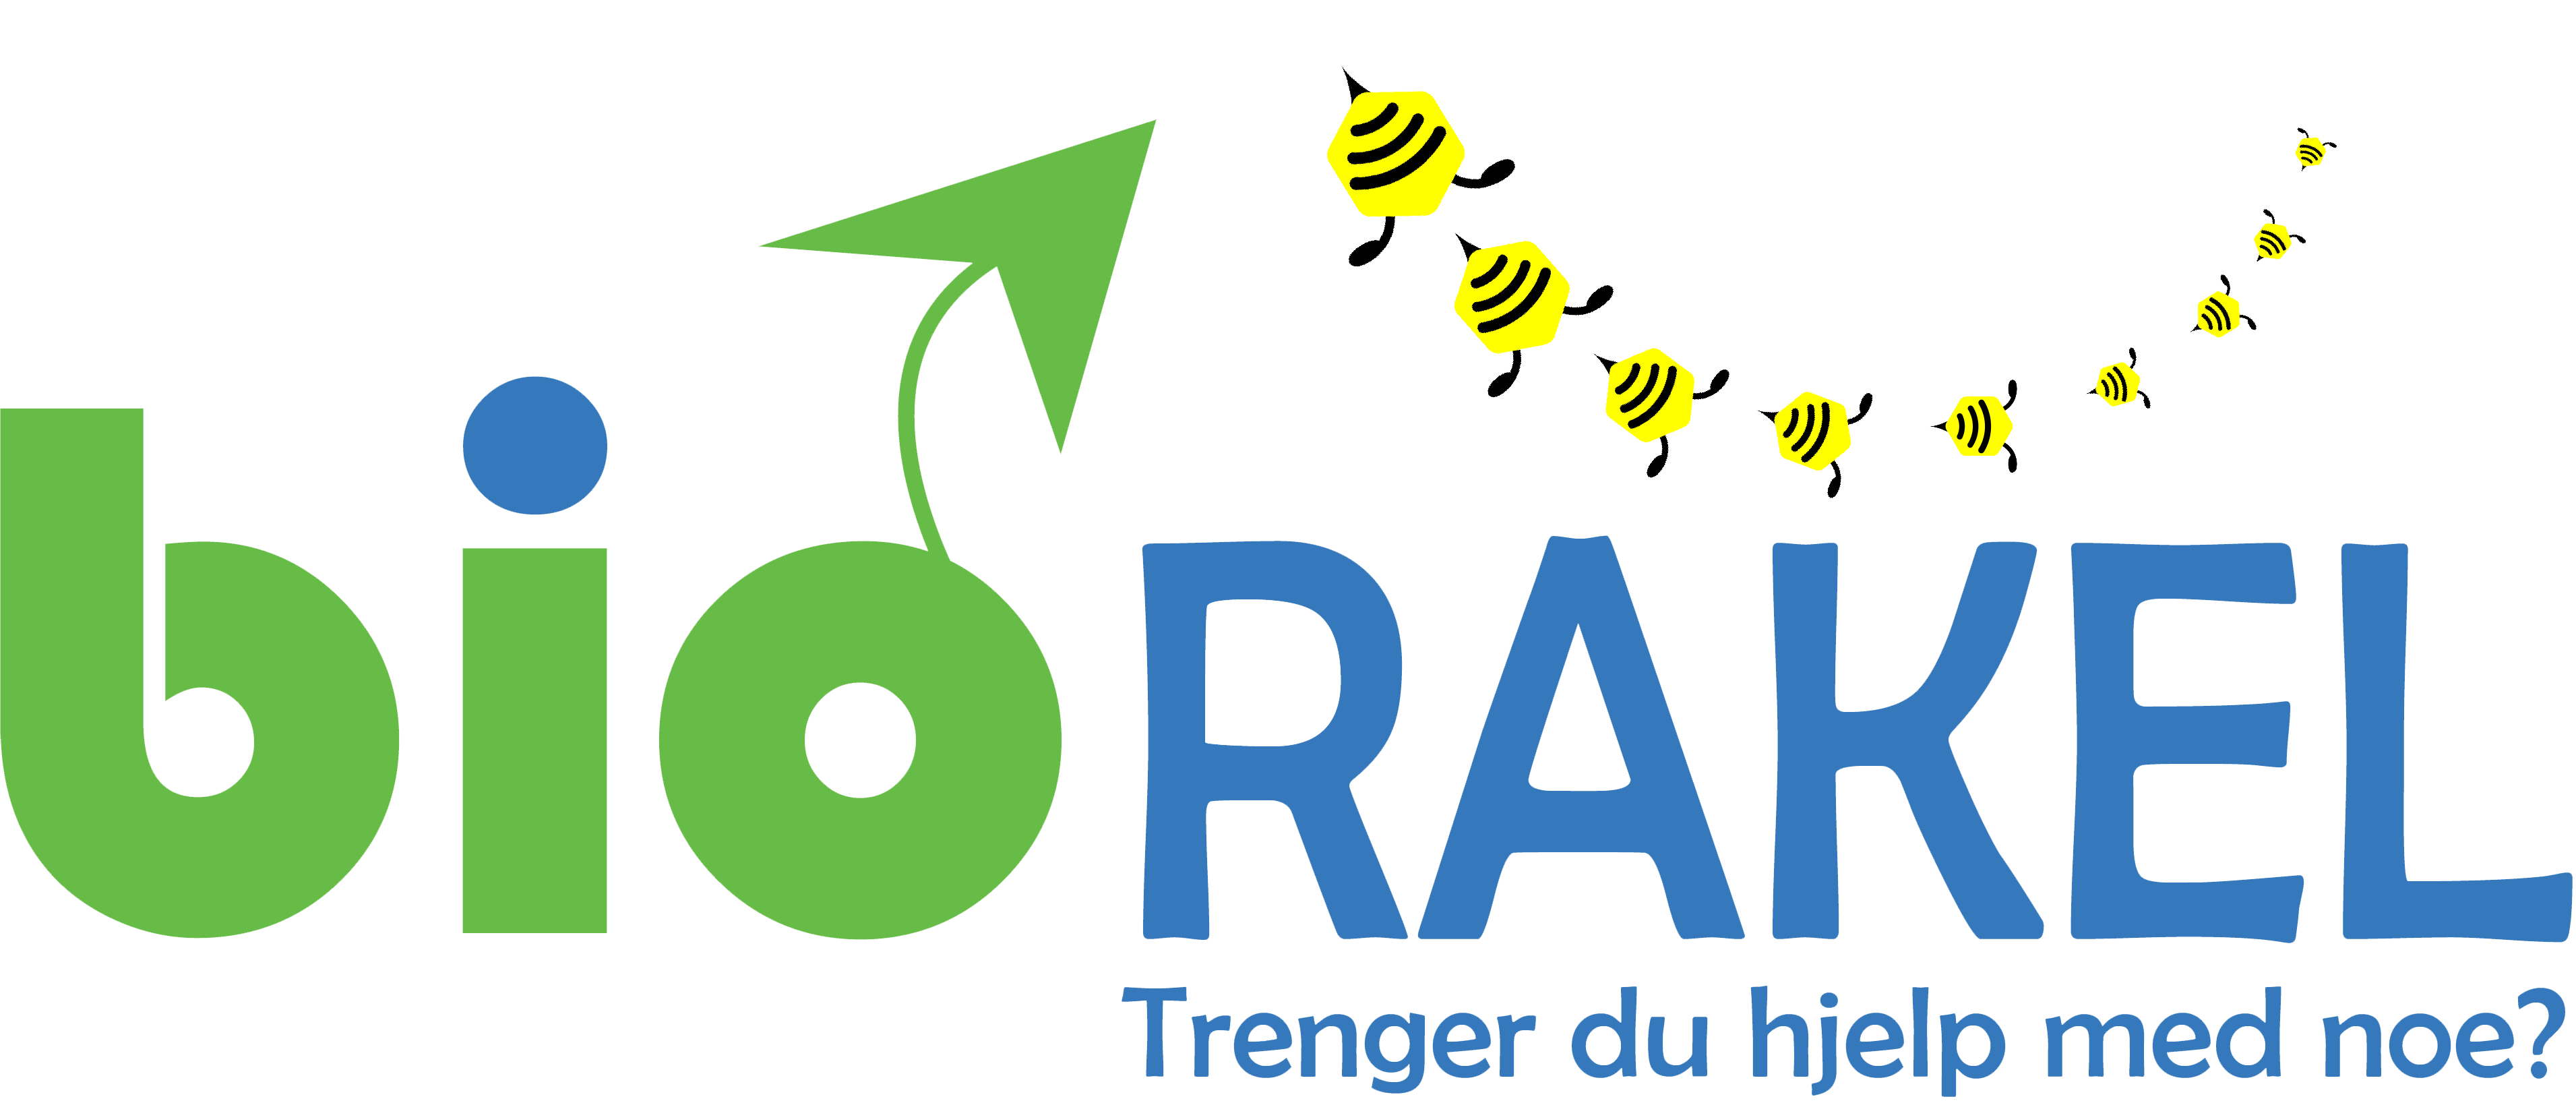 logo-biorakel-2-tagline-transparent